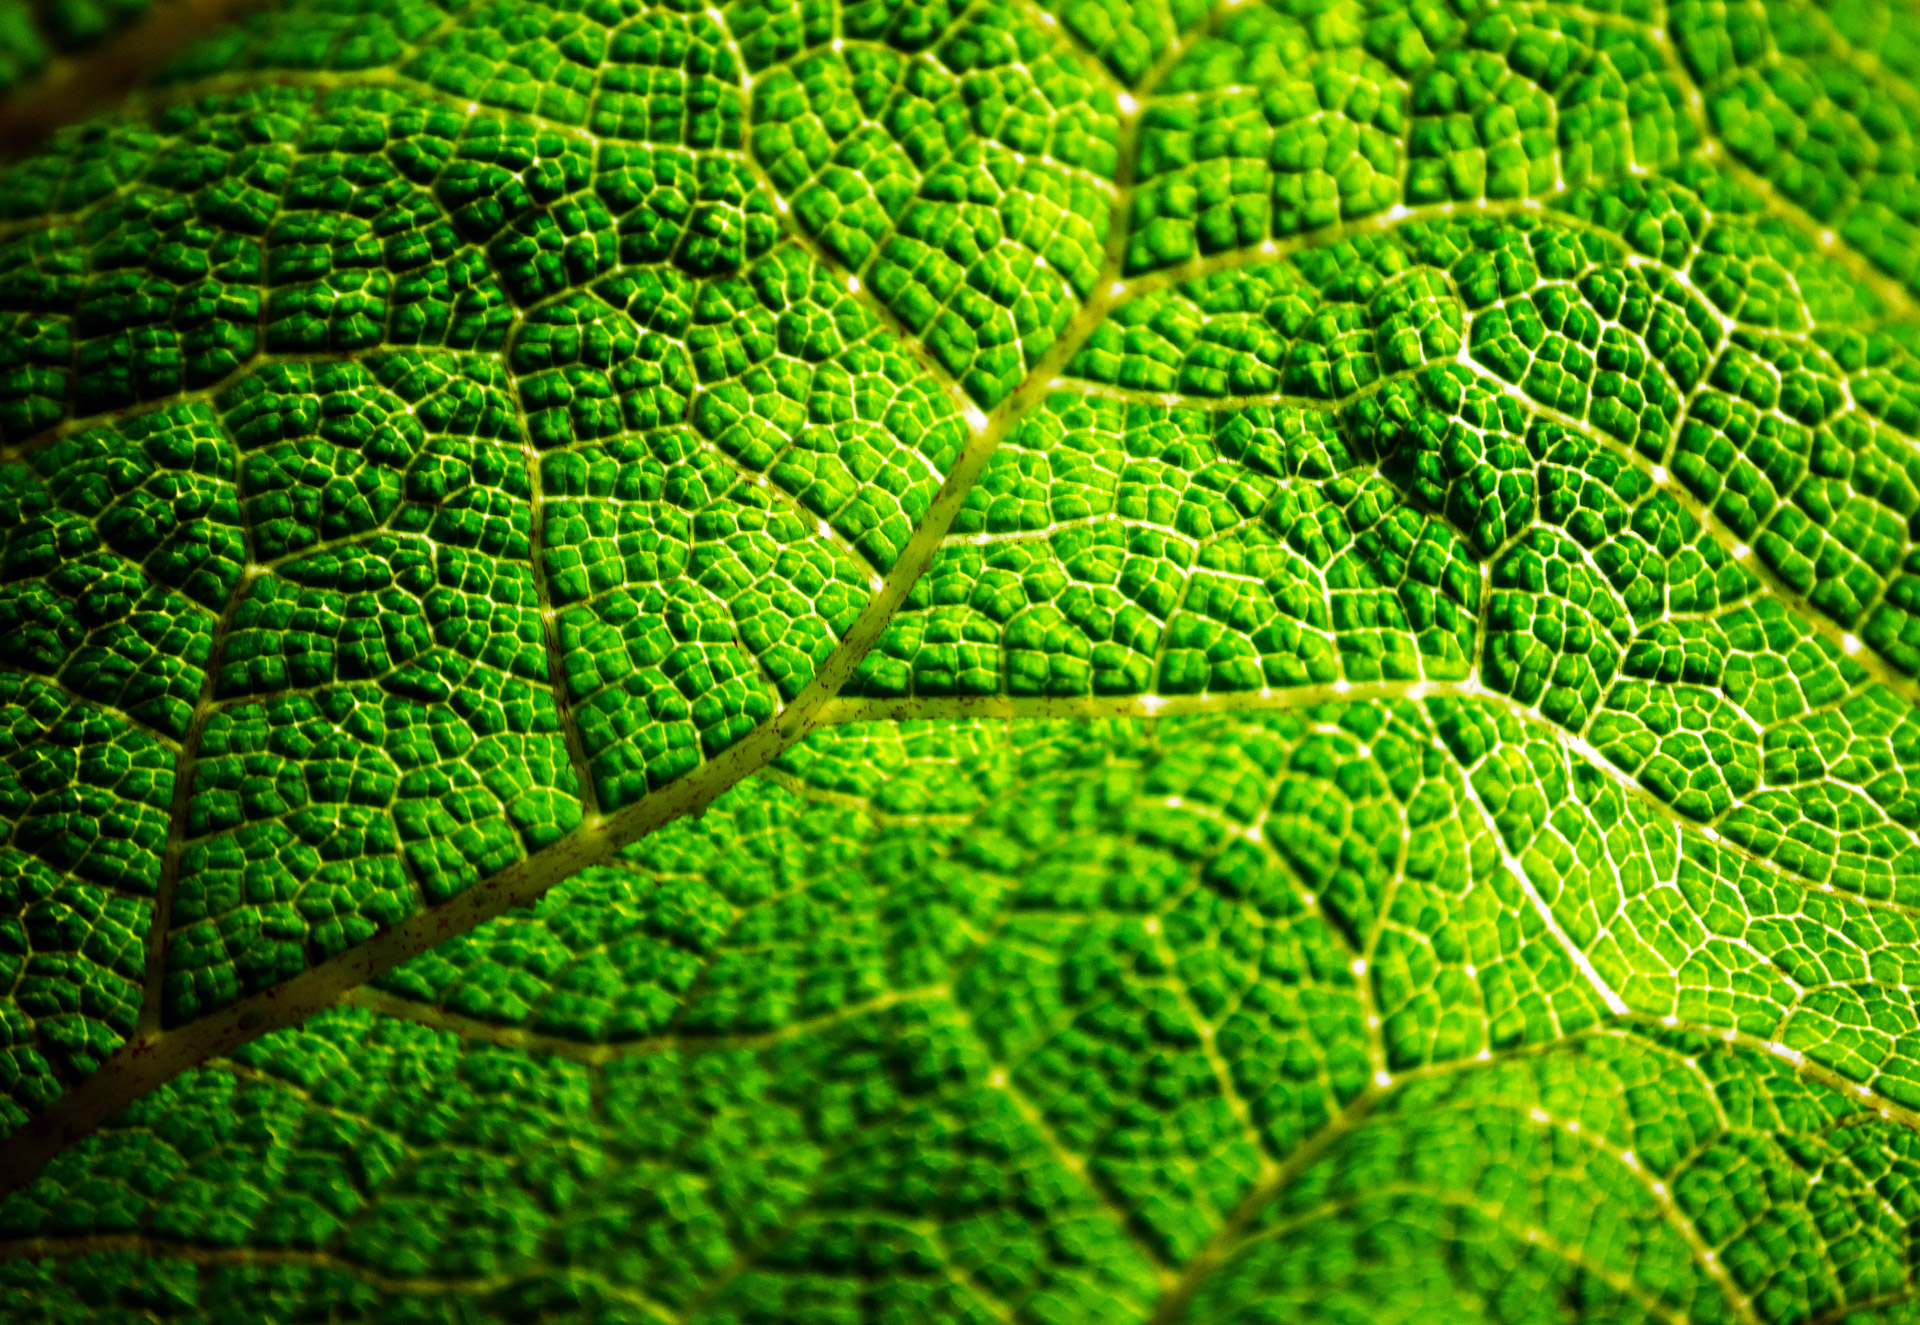 green-leaf-1340466788fks